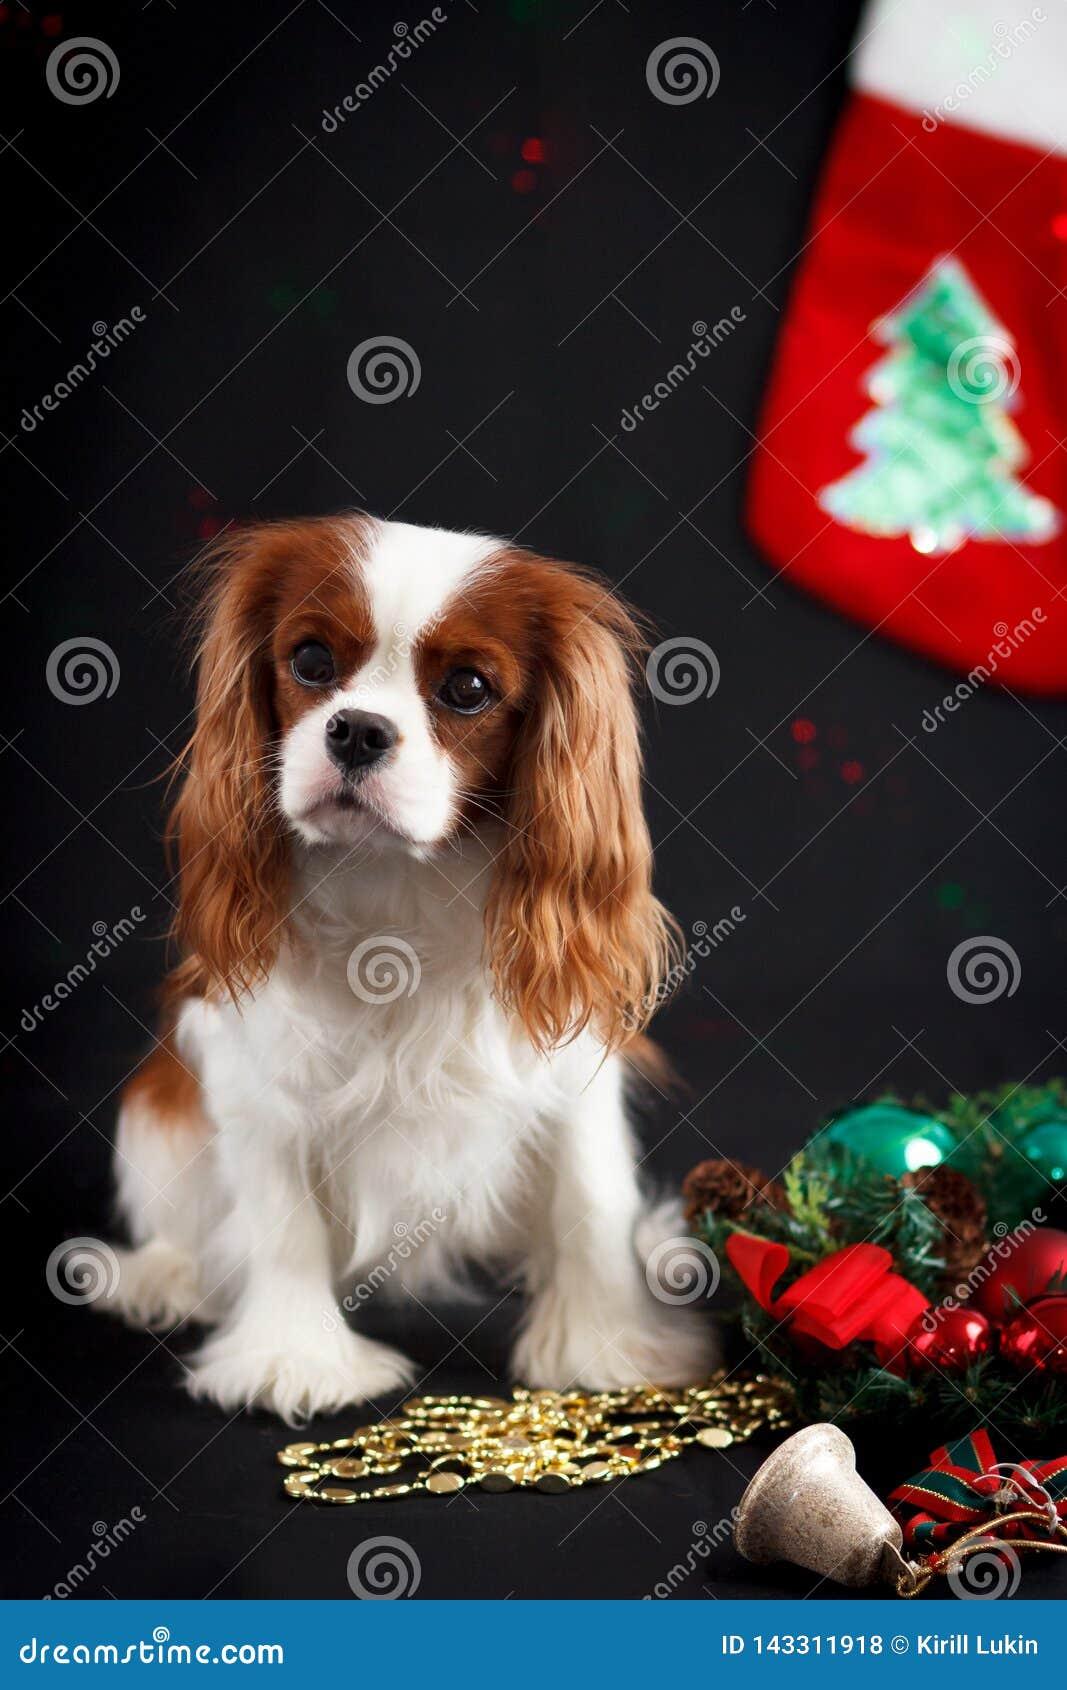 Christmas photo of cavalier king charles spaniel